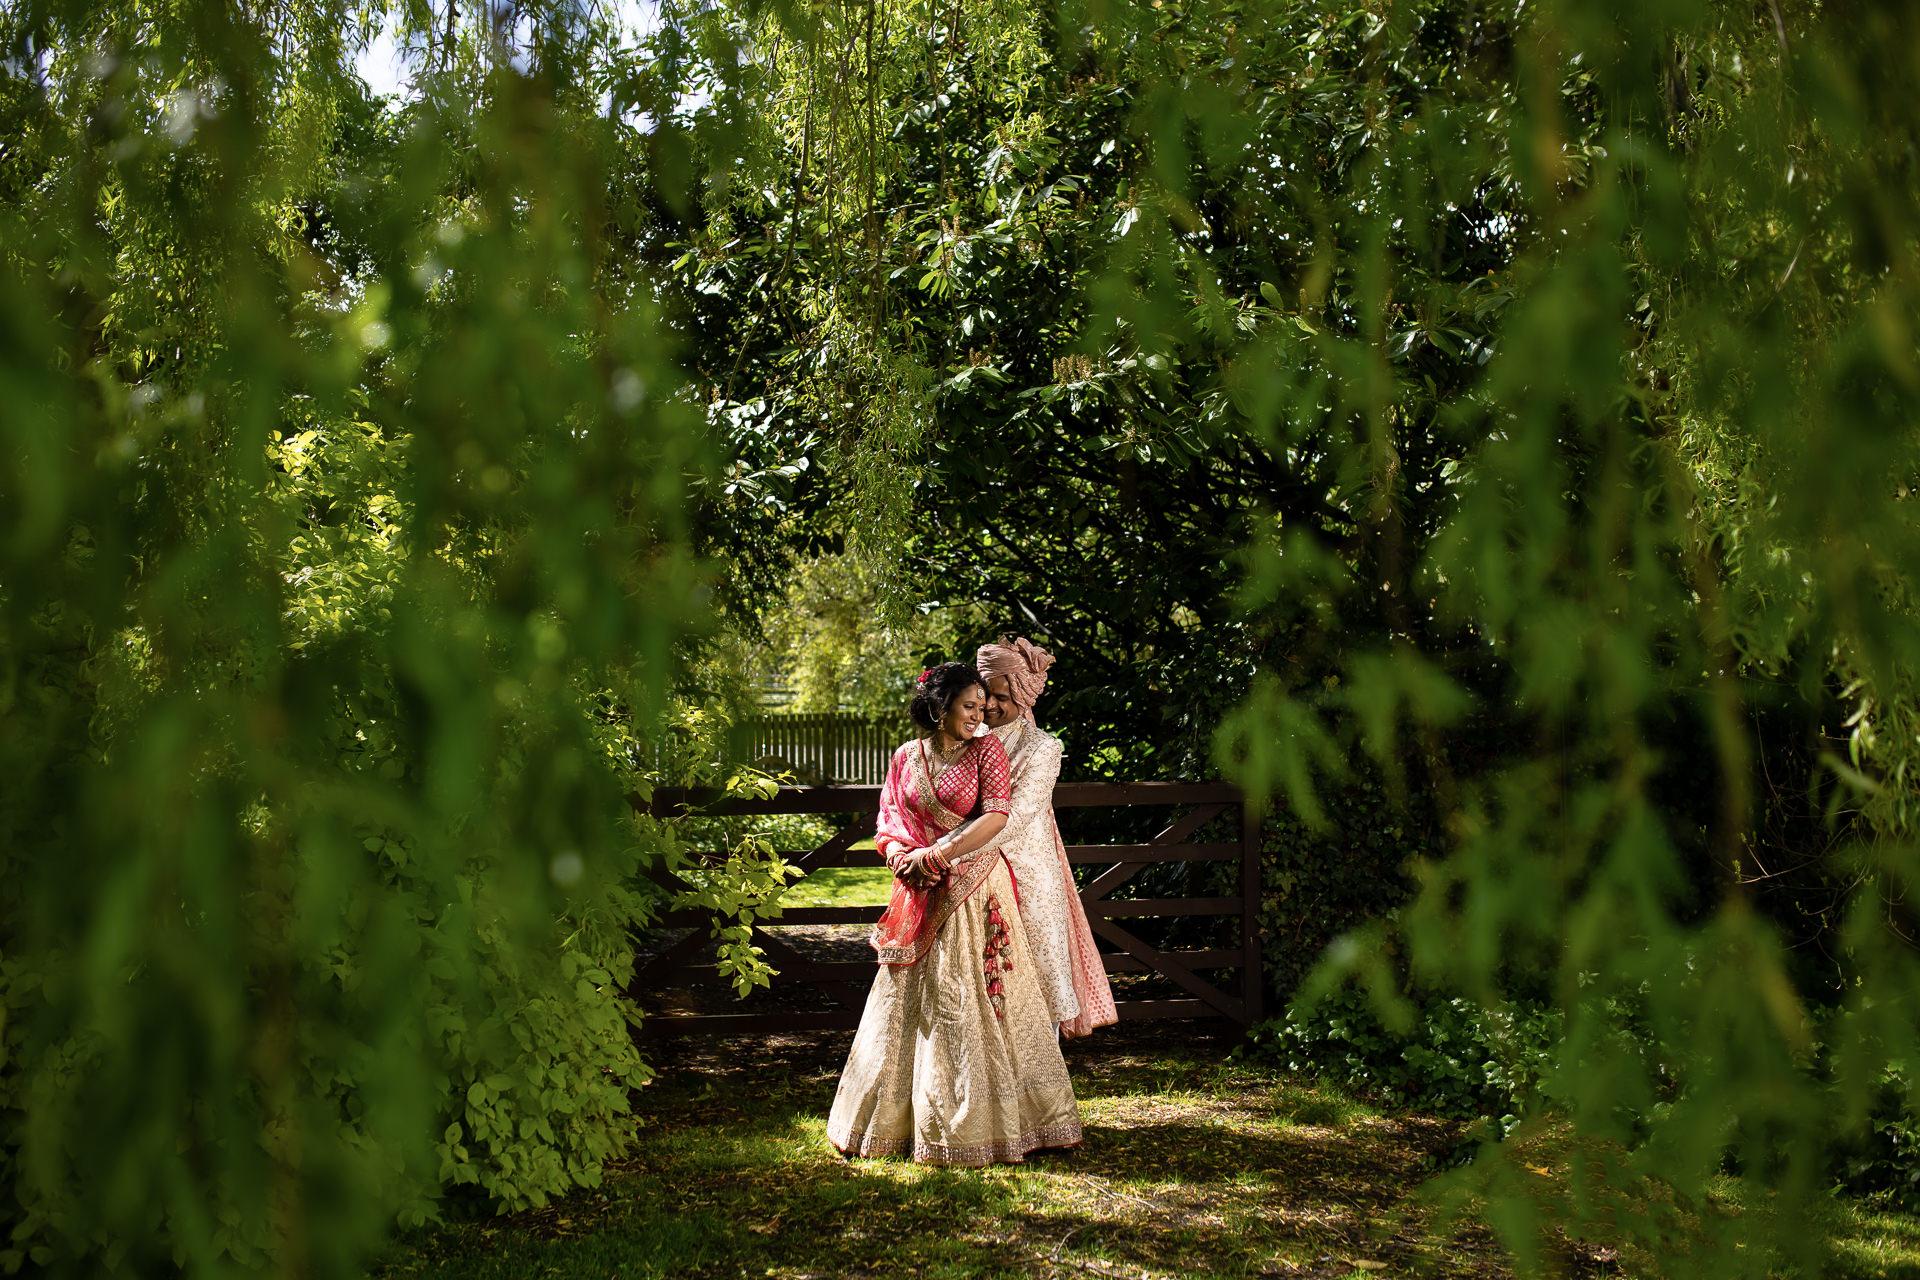 Tulsi & Roheet's Hindu wedding at The Priory Barn, Hitchin